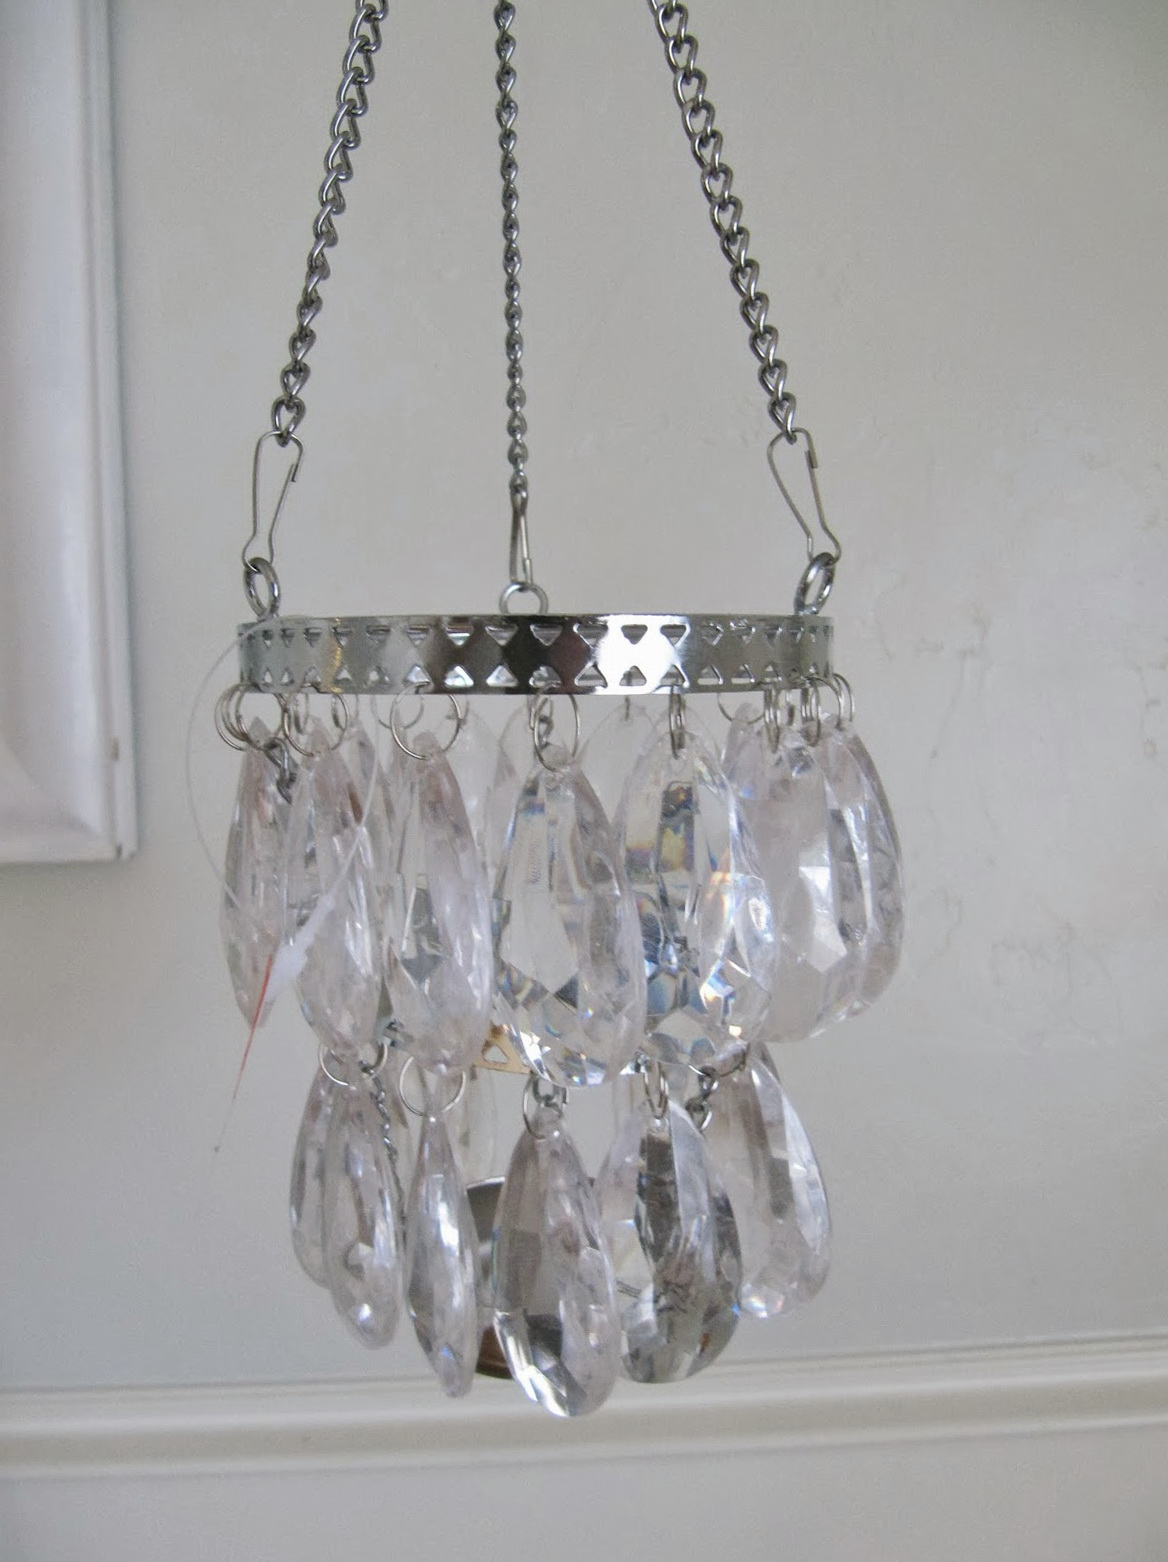 Hanging Tea Light Candle Chandelier